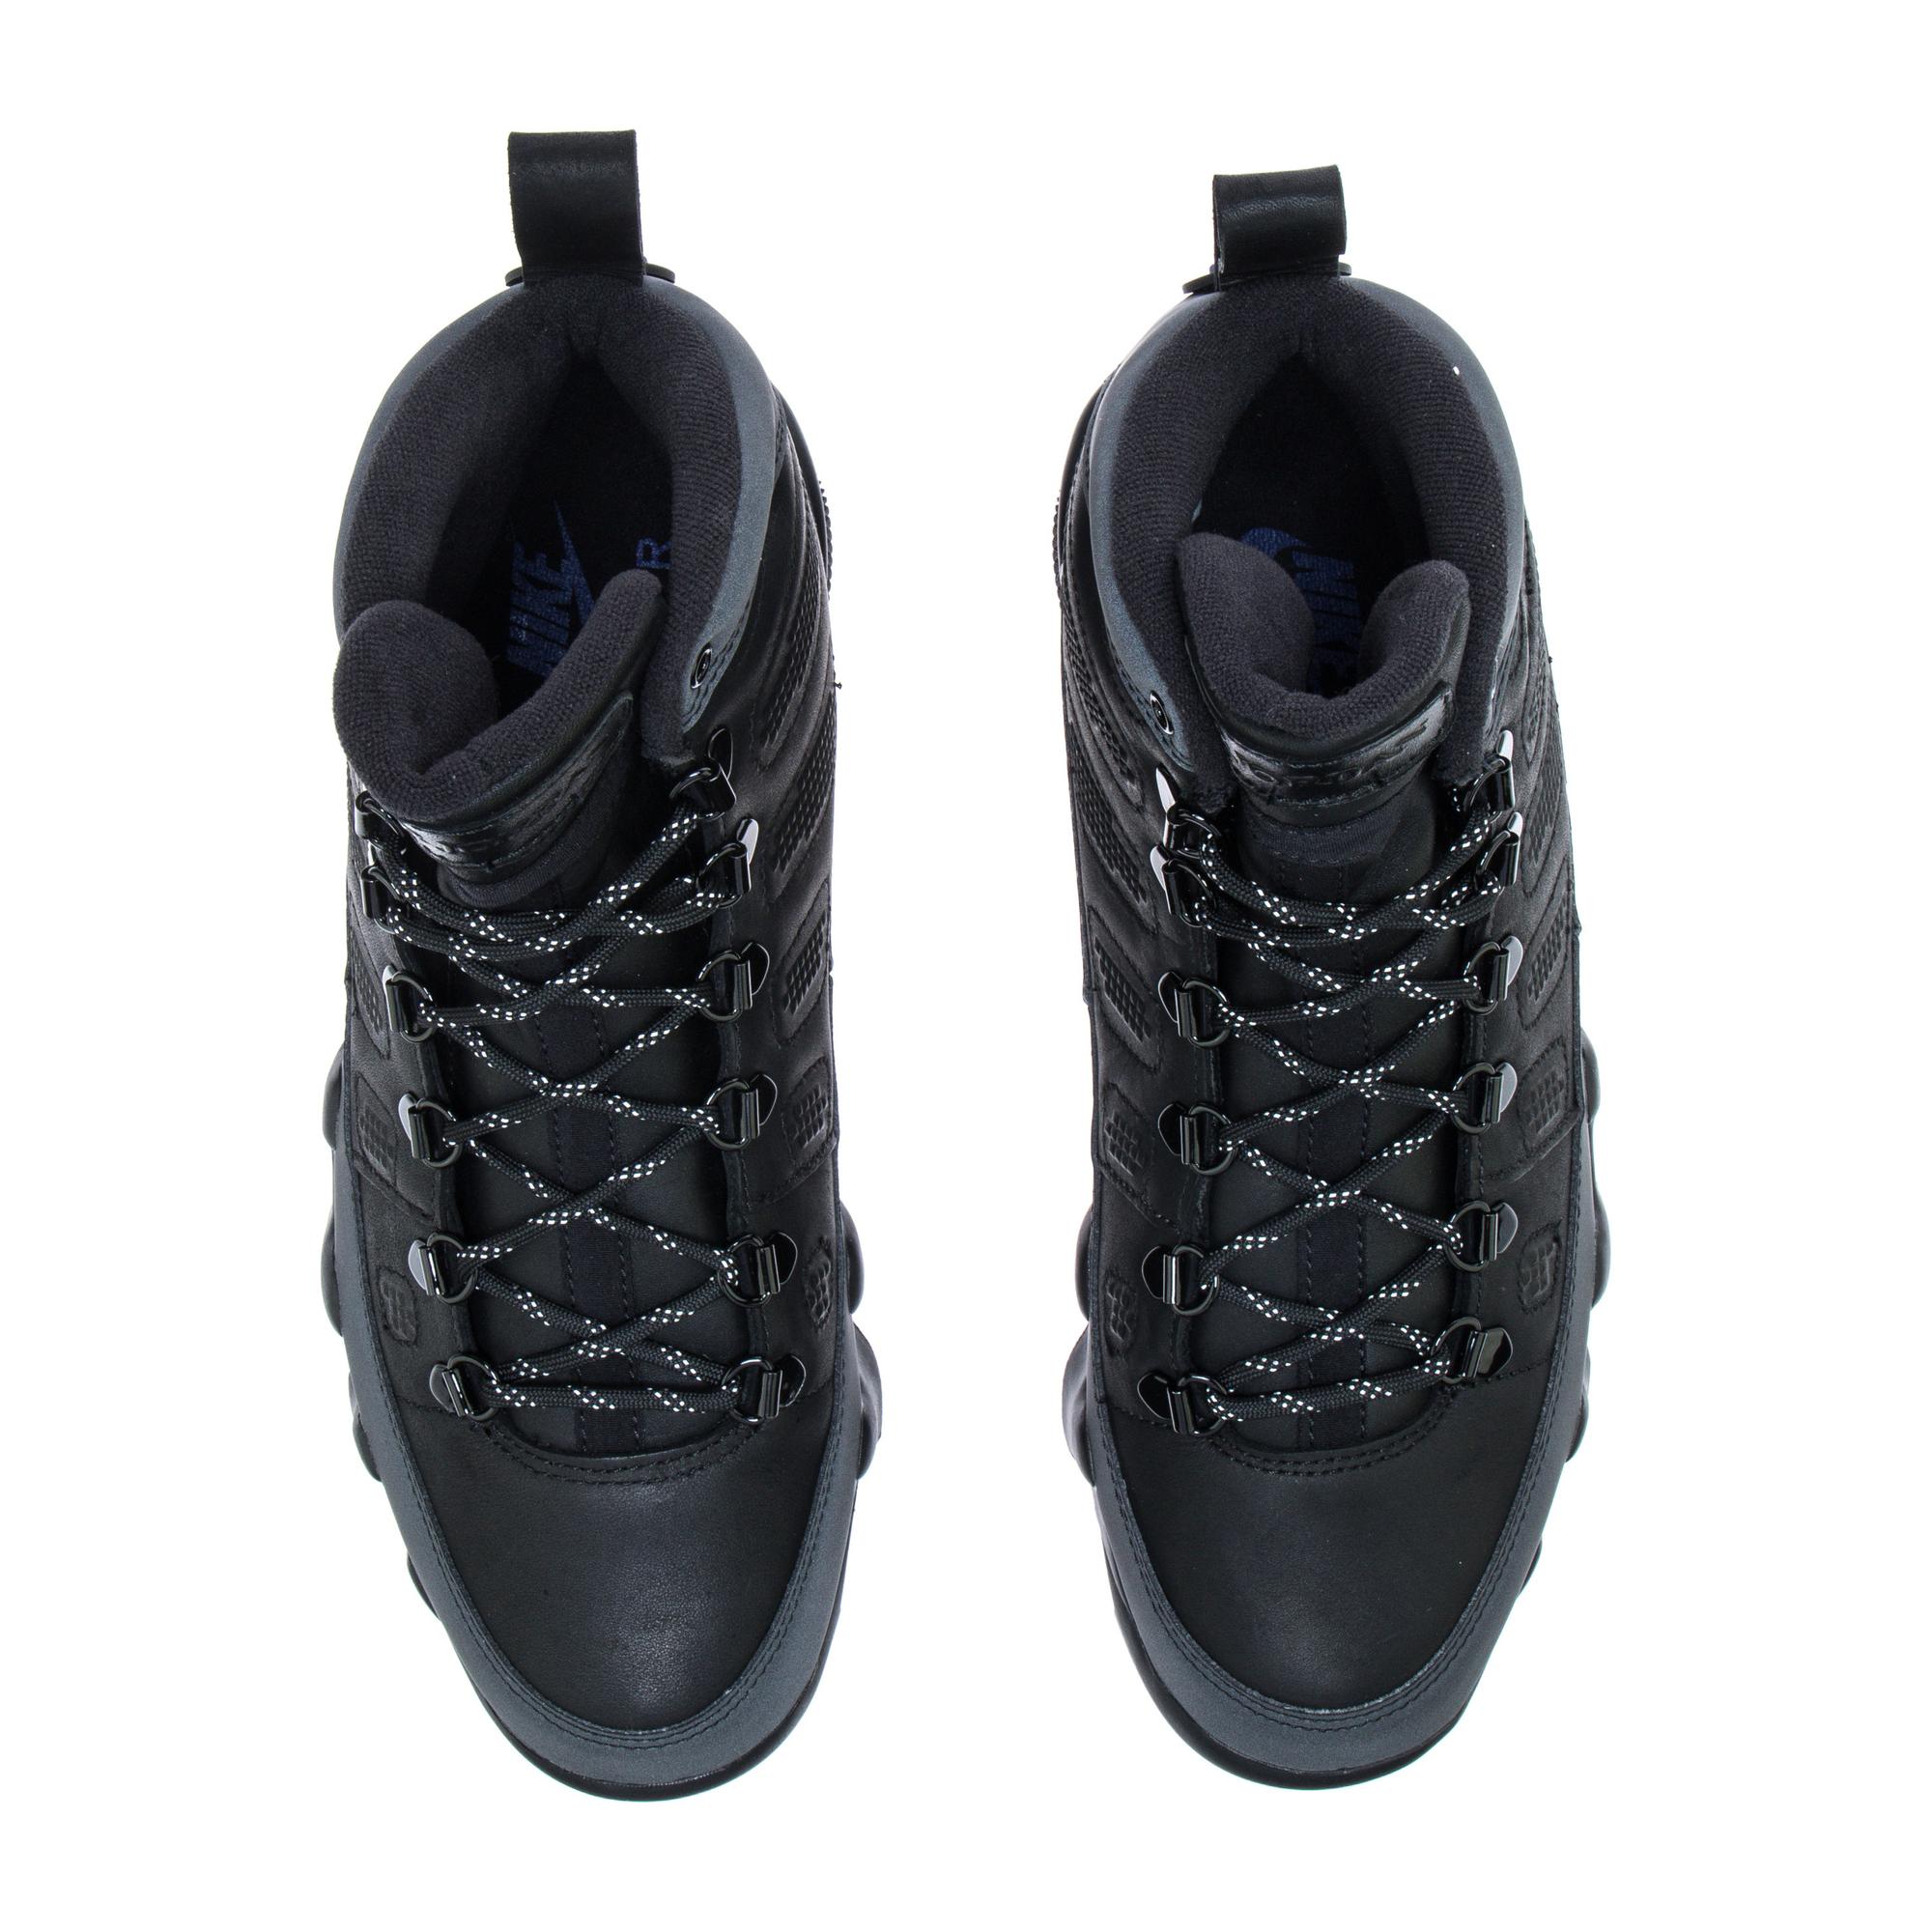 c77ffca0a27 ... inexpensive air jordan 9 boot nrg black concord 9c499 30744